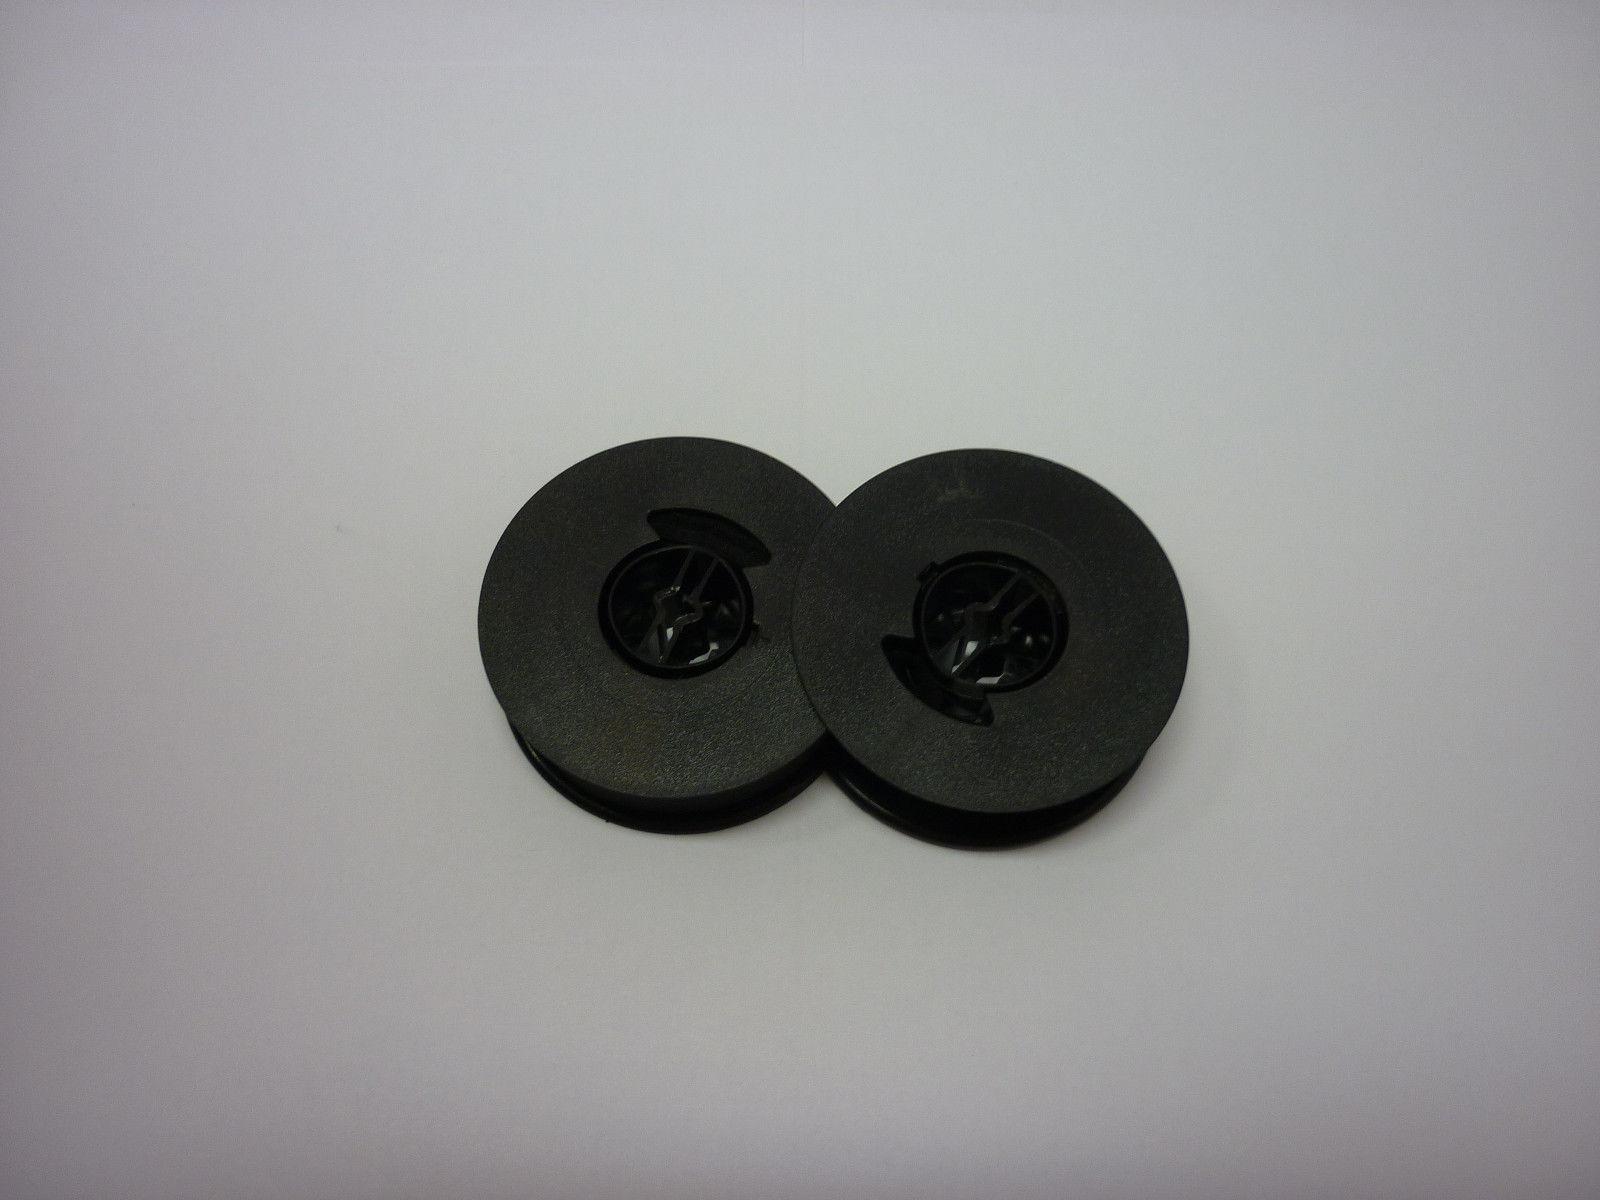 Brother Valiant 391 413 613 Typewriter Ribbon Black Twin Spool (2  Pack)